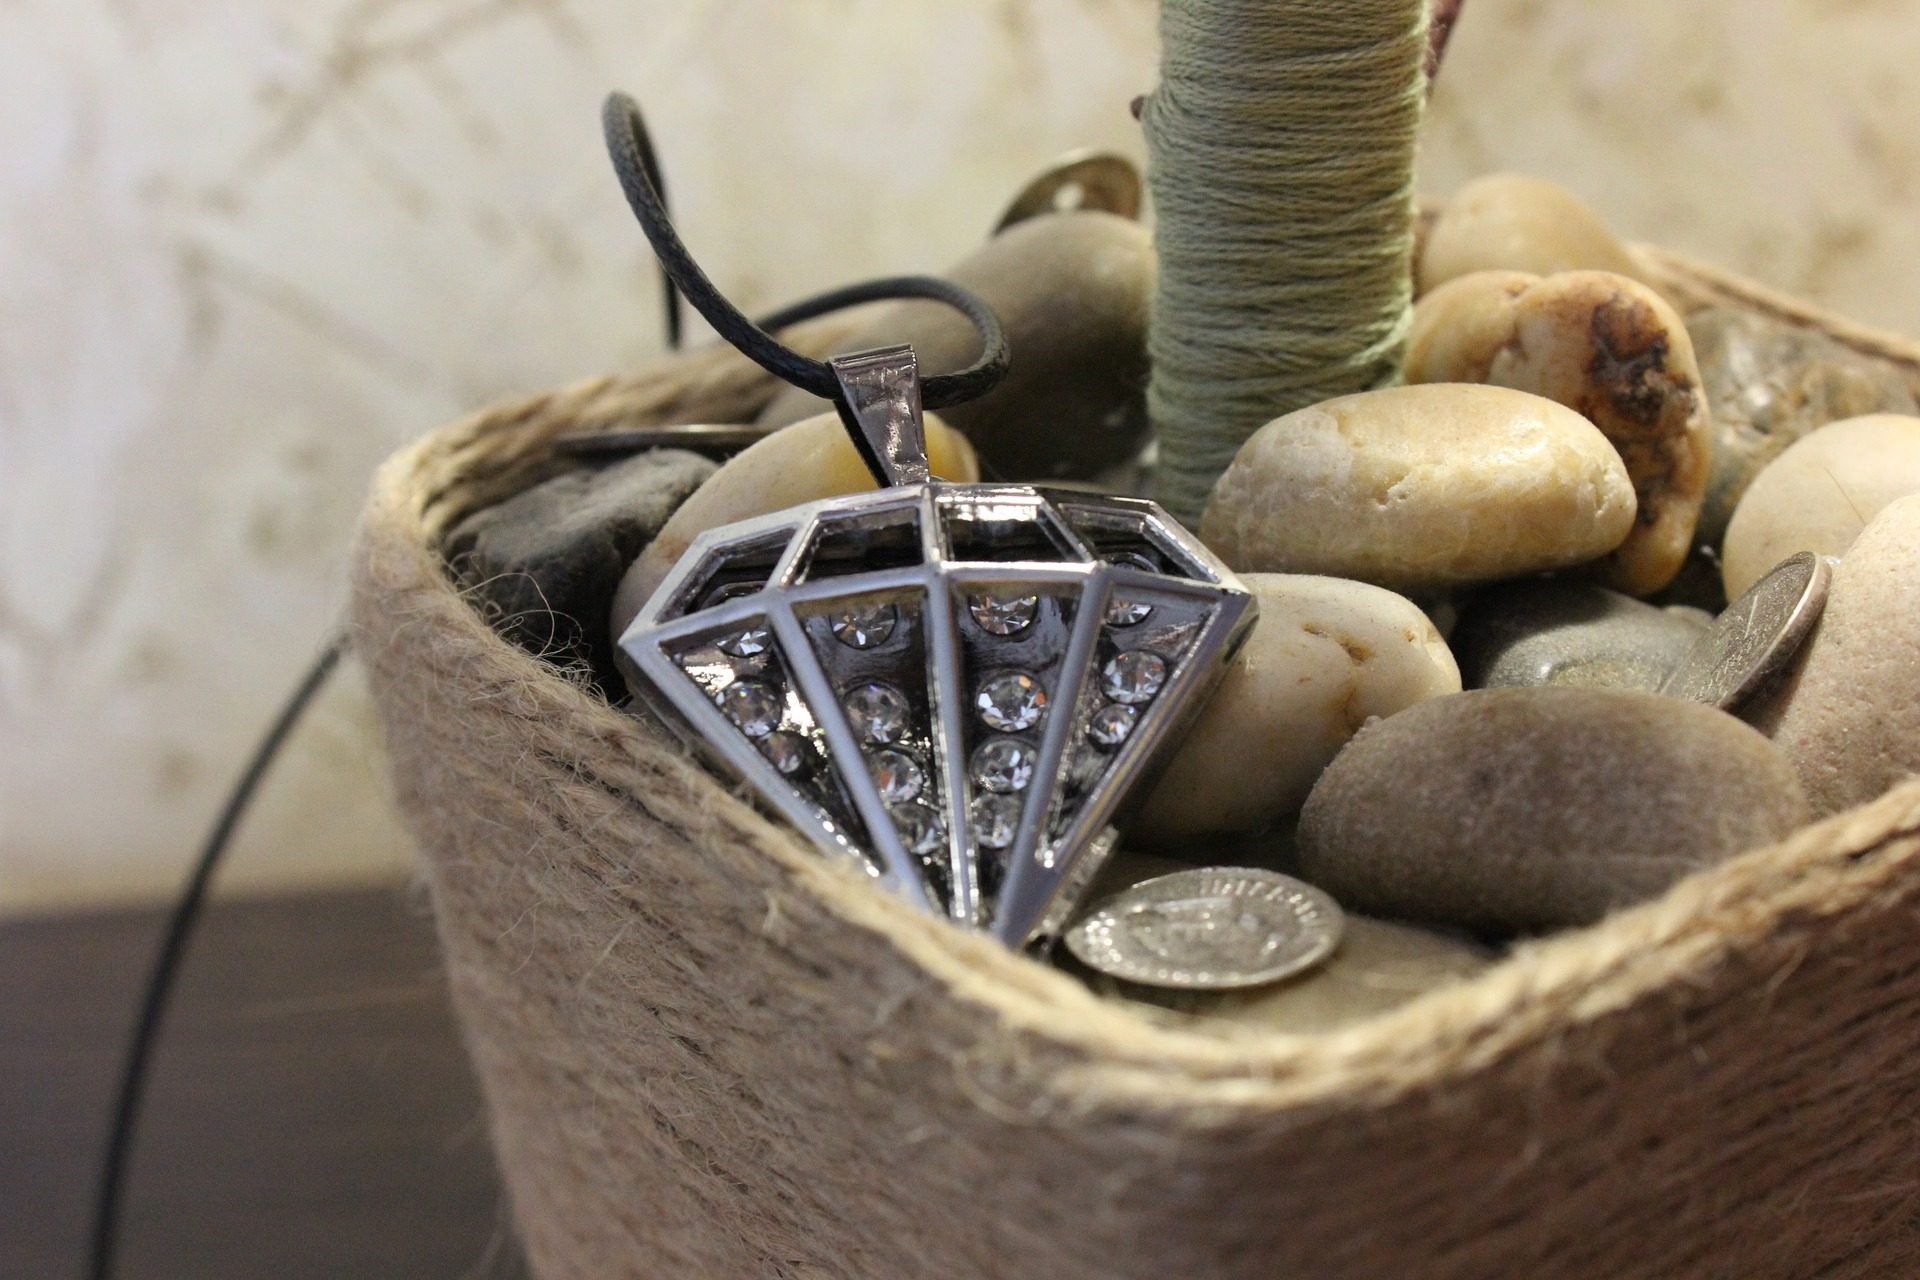 collar, diamantes, joya, maceta, piedras, monedas, mimbre - Fondos de Pantalla HD - professor-falken.com